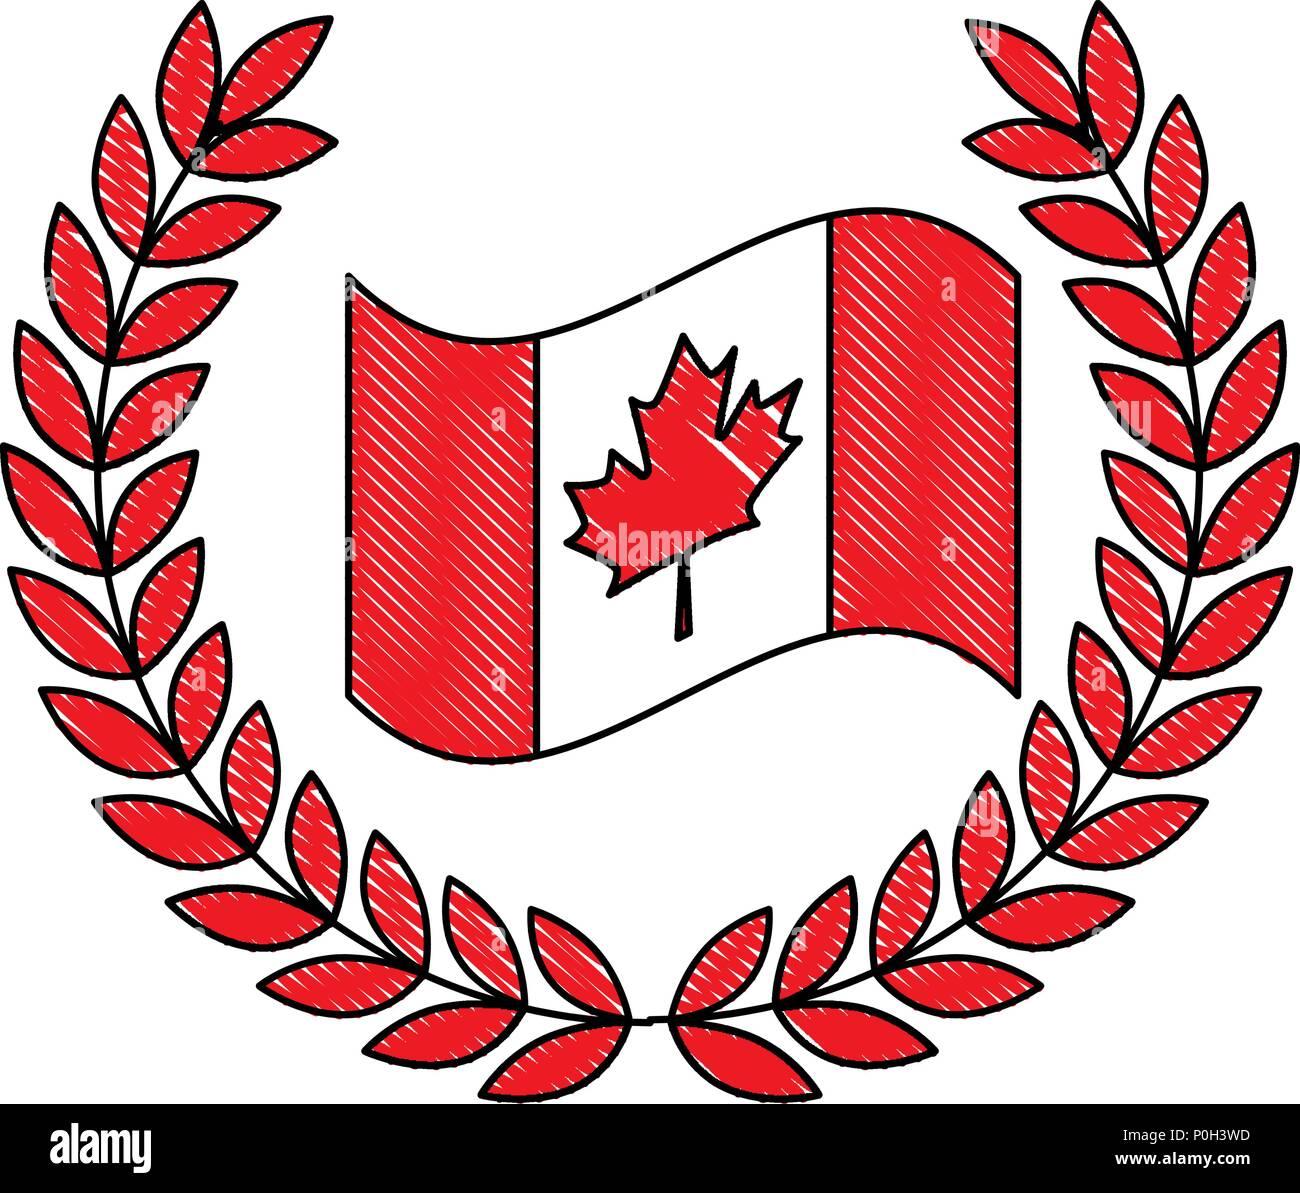 Fantastisch Vintage Rahmen Kanada Fotos - Rahmen Ideen ...